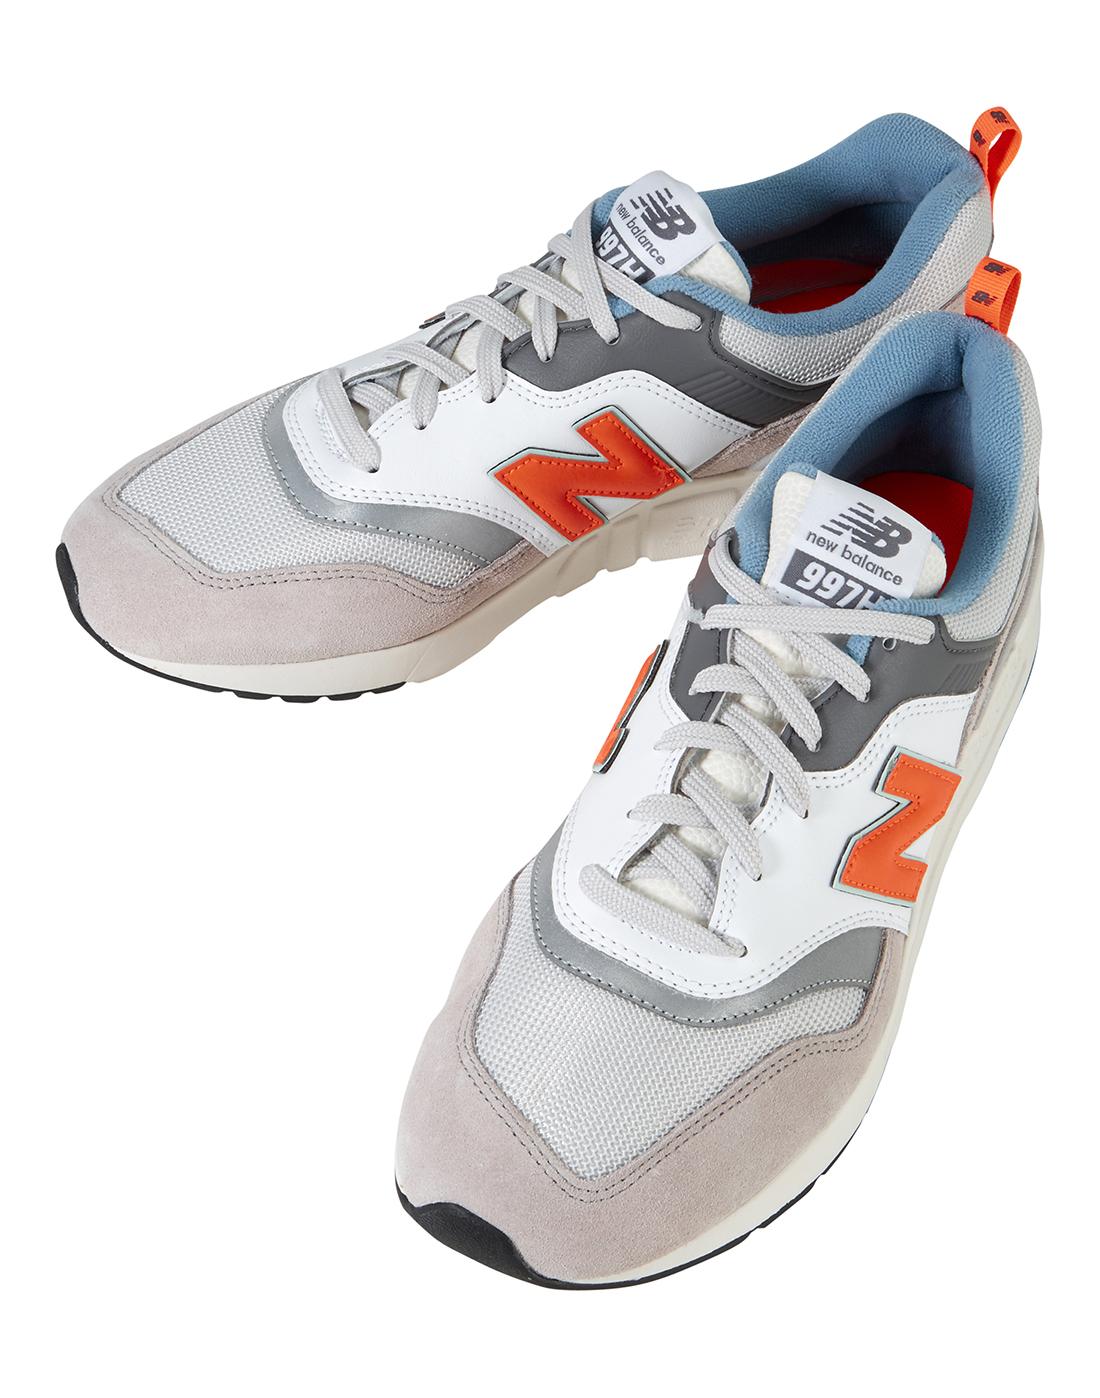 ecc94ef304031 Men's Grey & Orange New Balance 997 Trainer | Life Style Sports